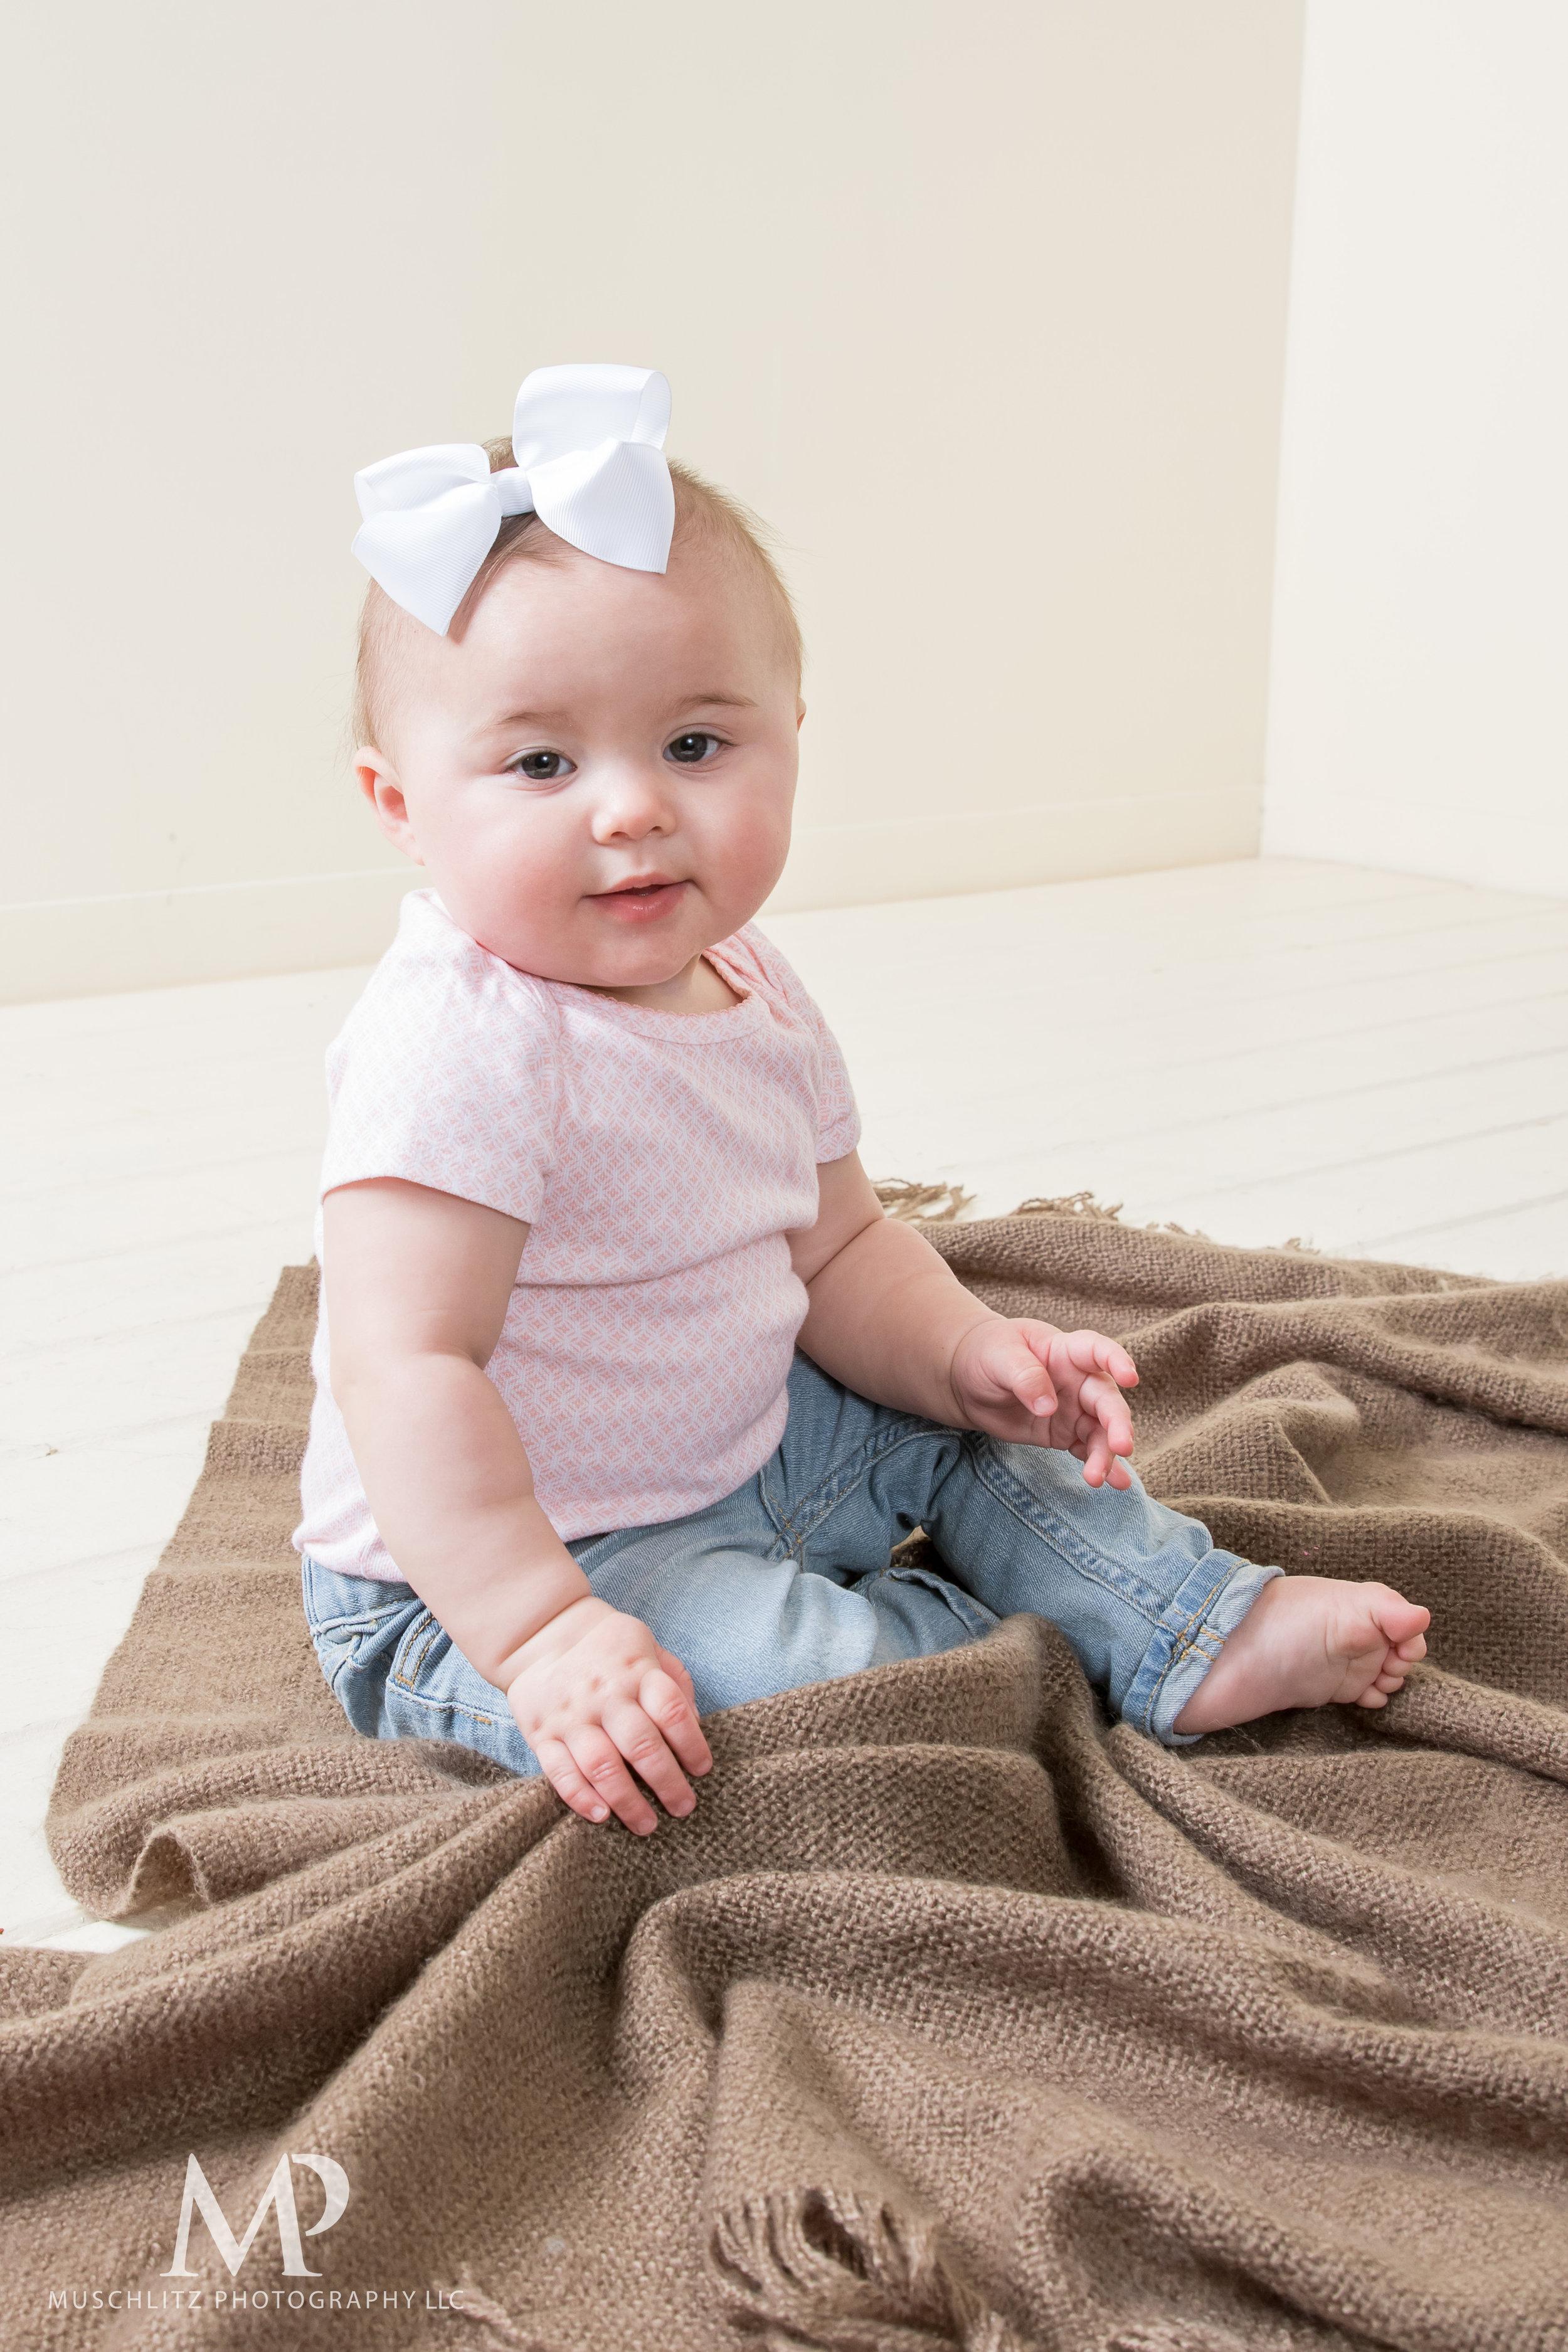 0-family-baby-portrait-gahanna-columbus-photographer-studio-009.JPG